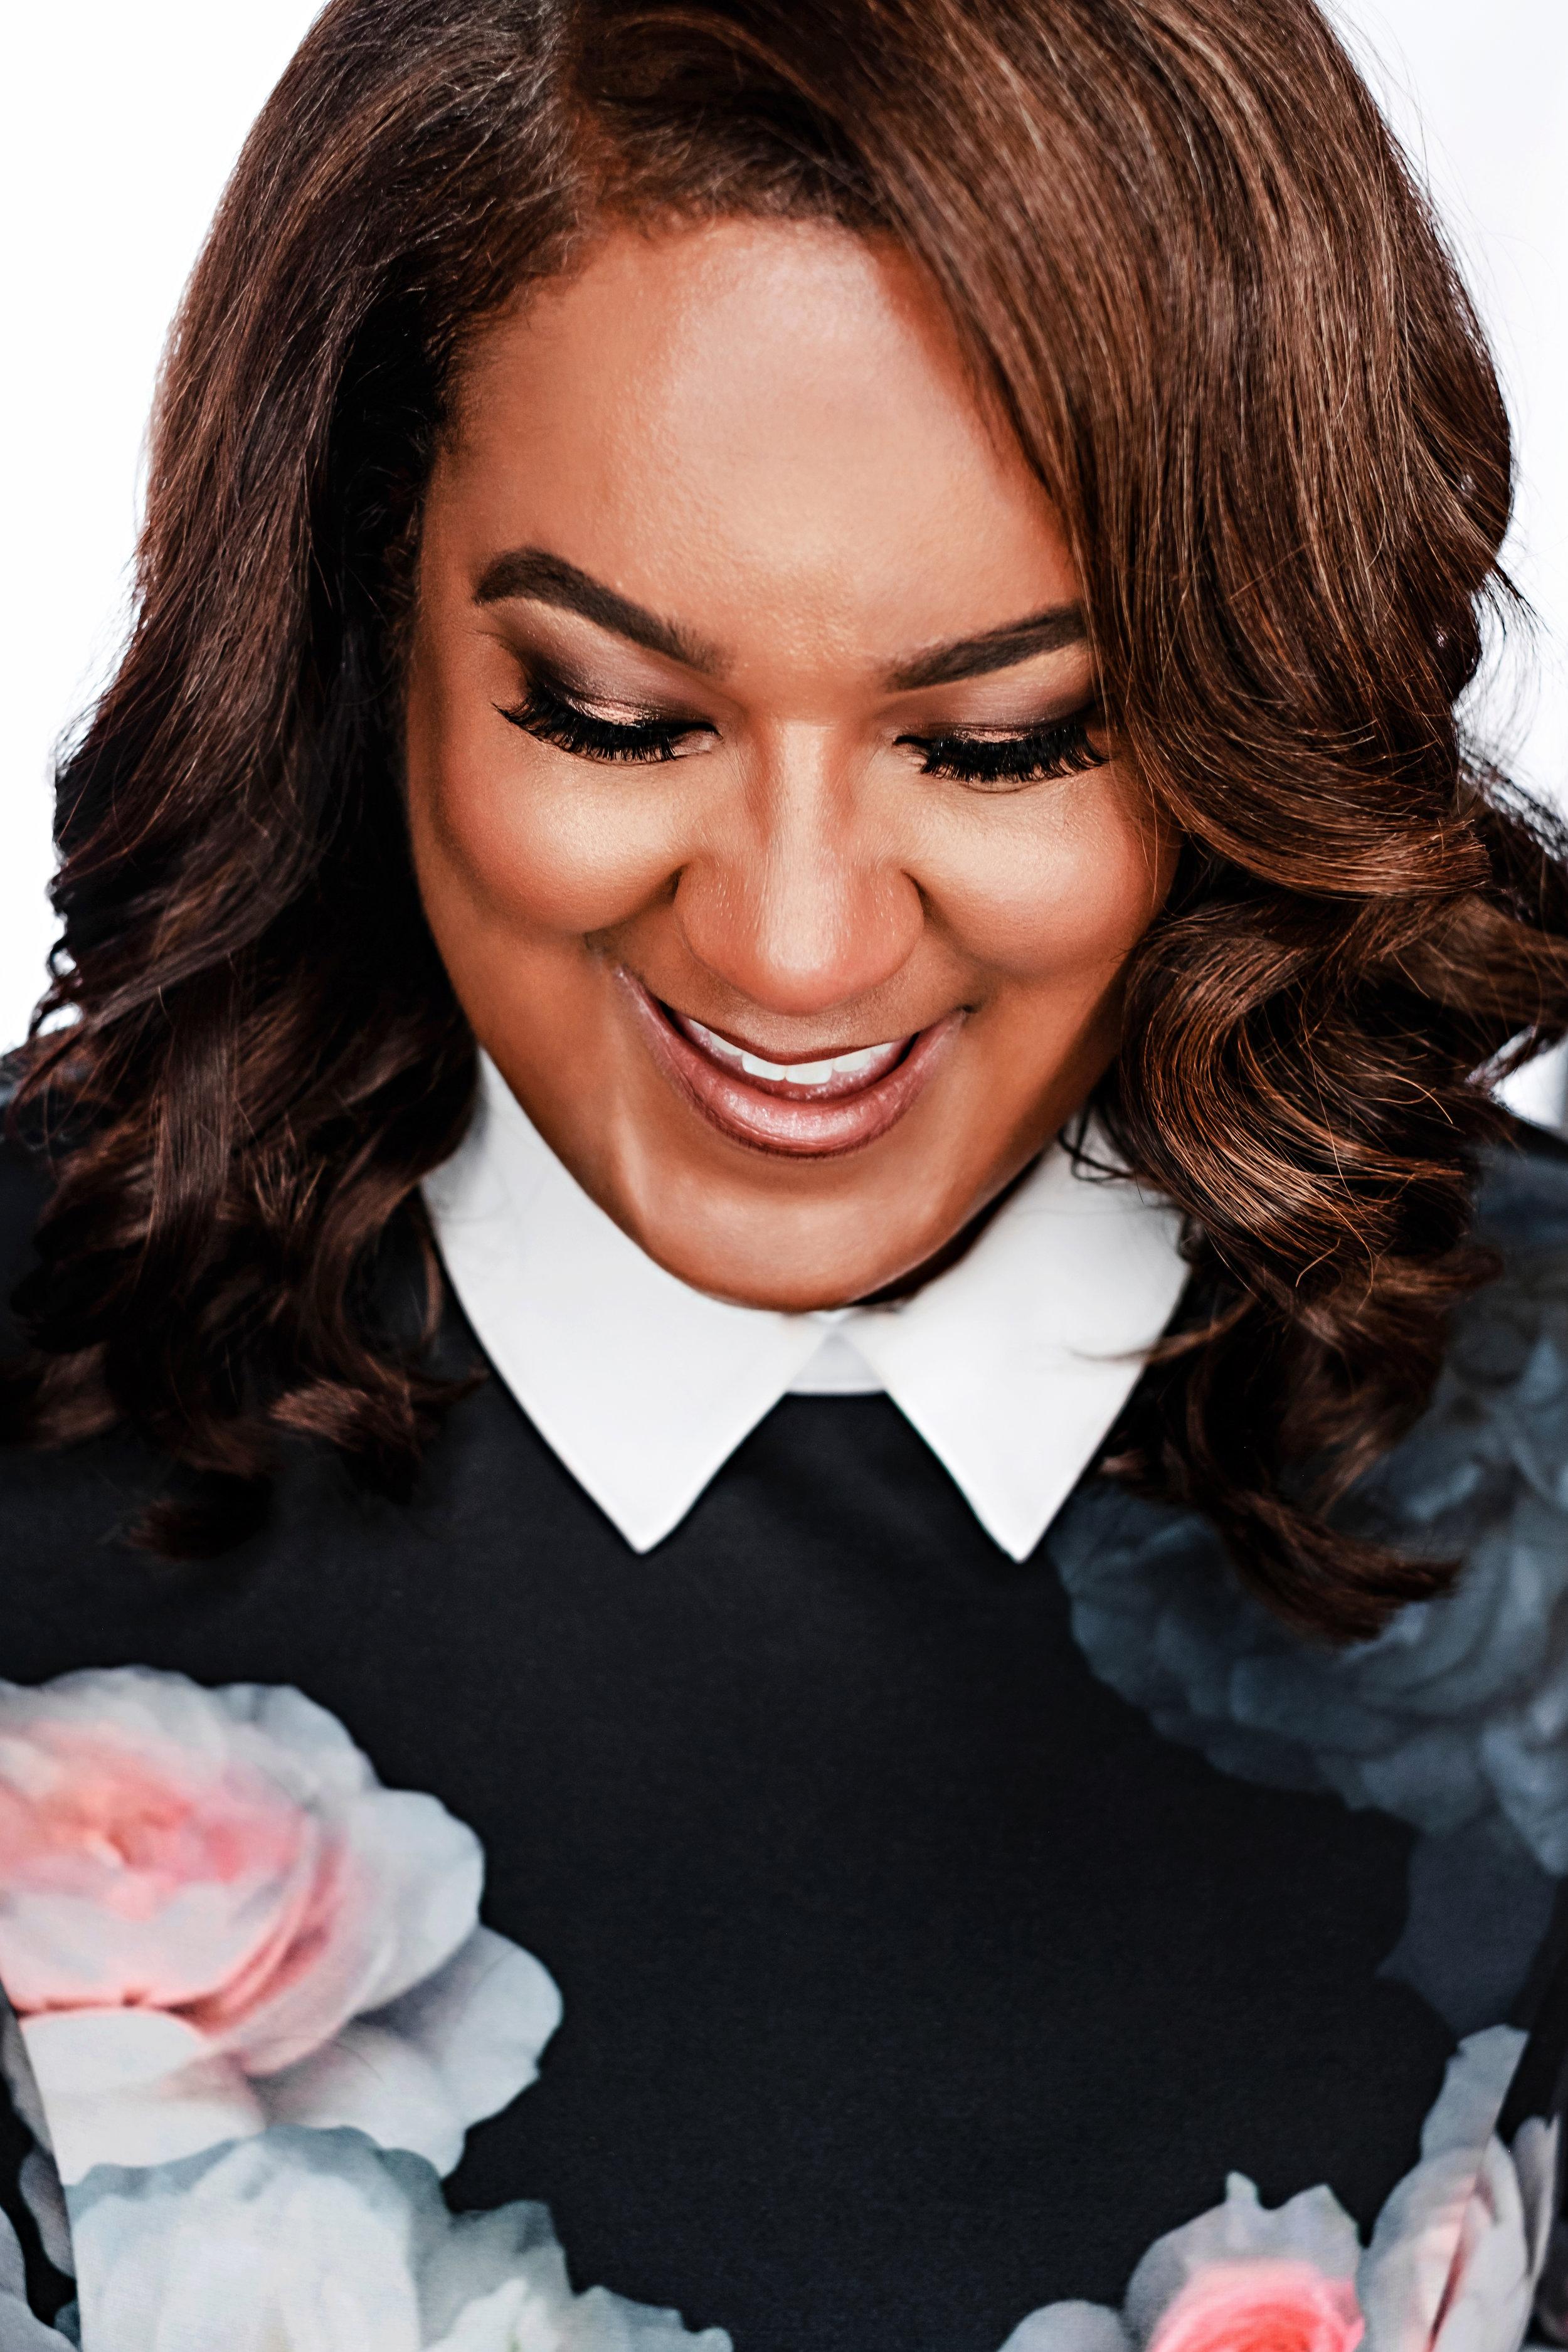 Professional headshots by top Atlanta photographer, Chelsea Patricia